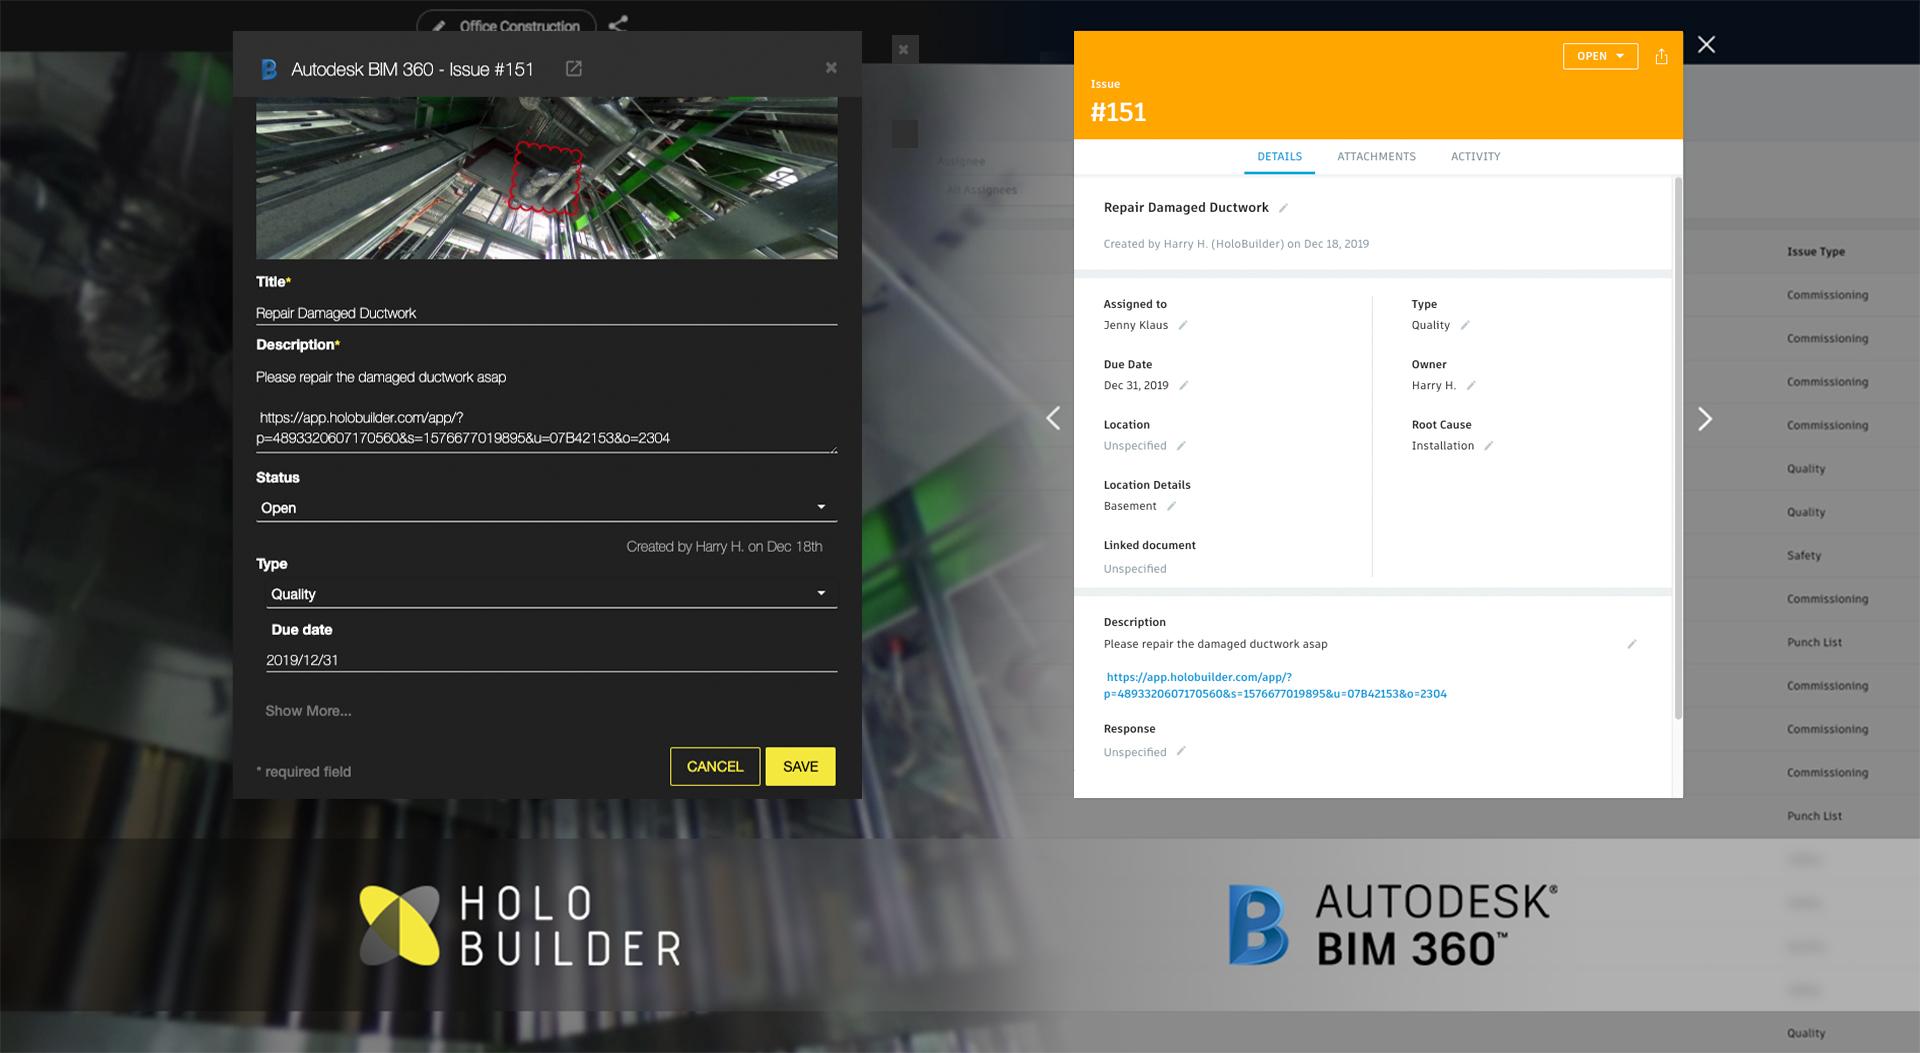 1 - HoloBuilder & Autodesk BIM 360 Integration